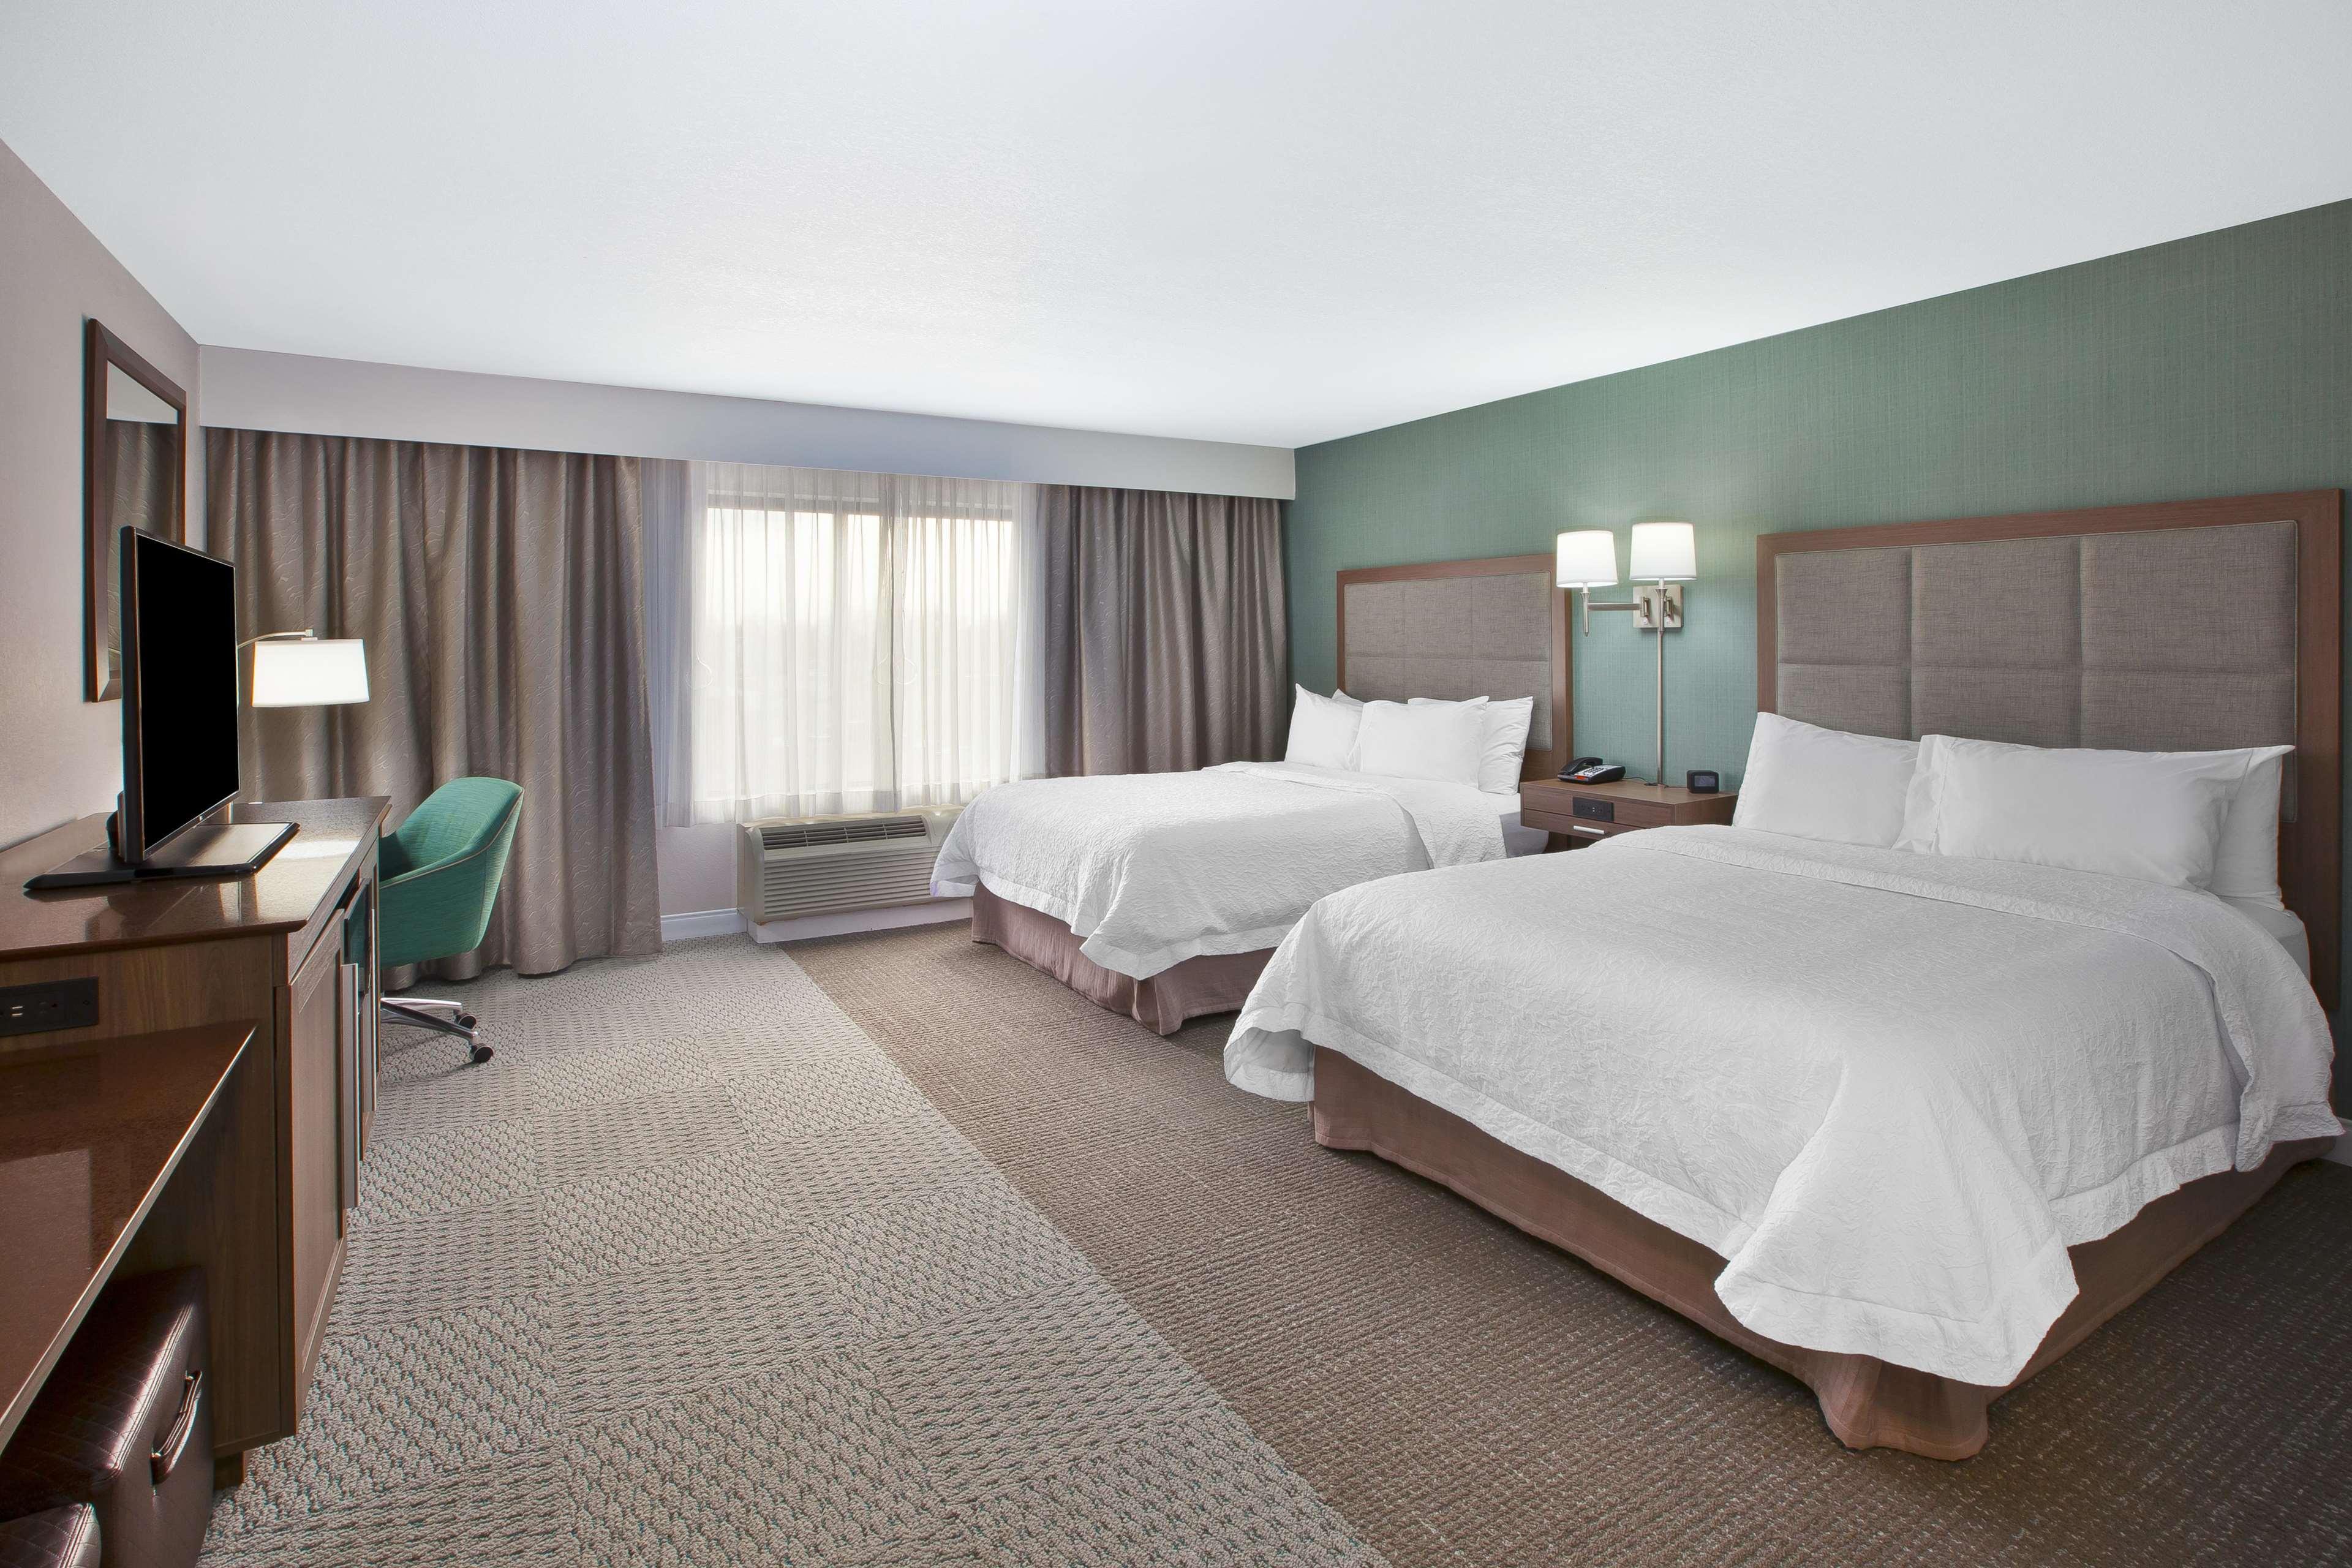 Hampton Inn & Suites Alliance image 11